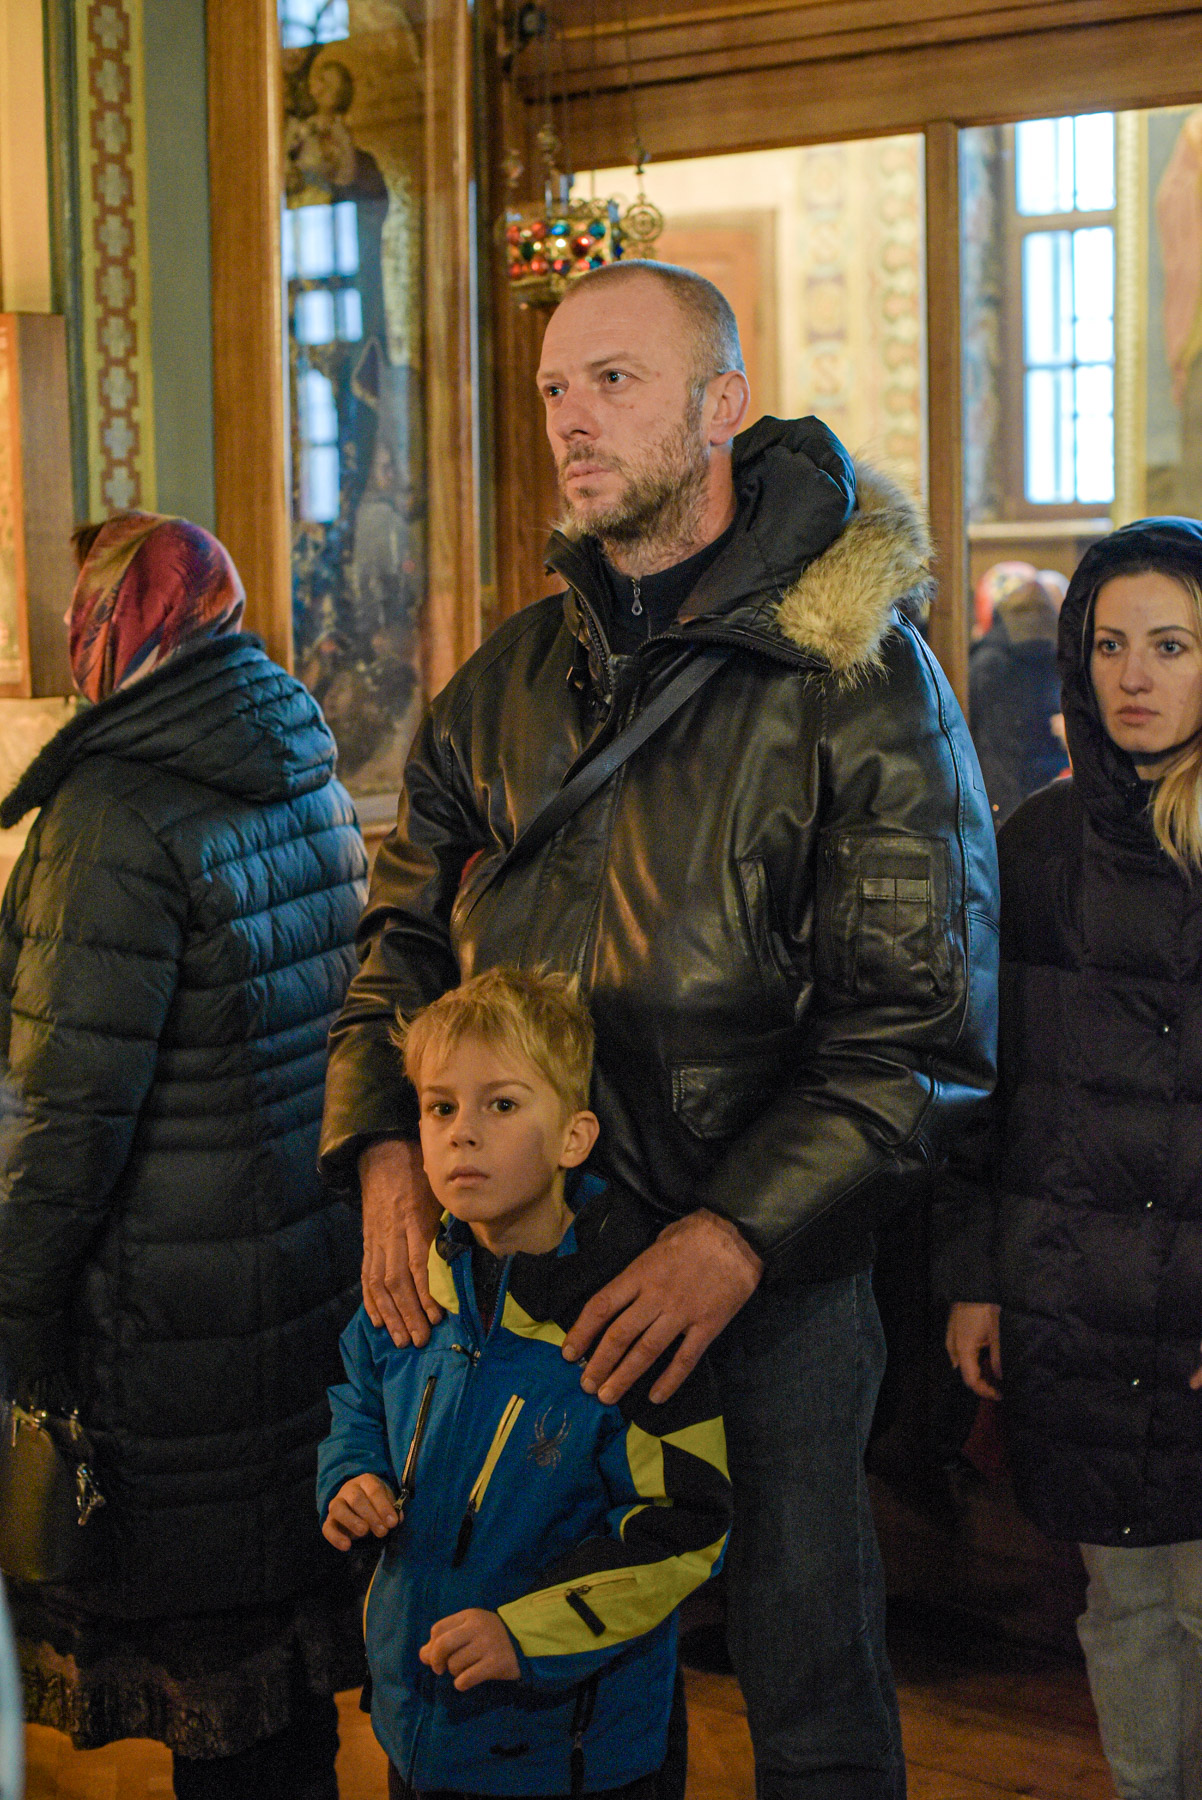 photos of orthodox christmas 0242 2